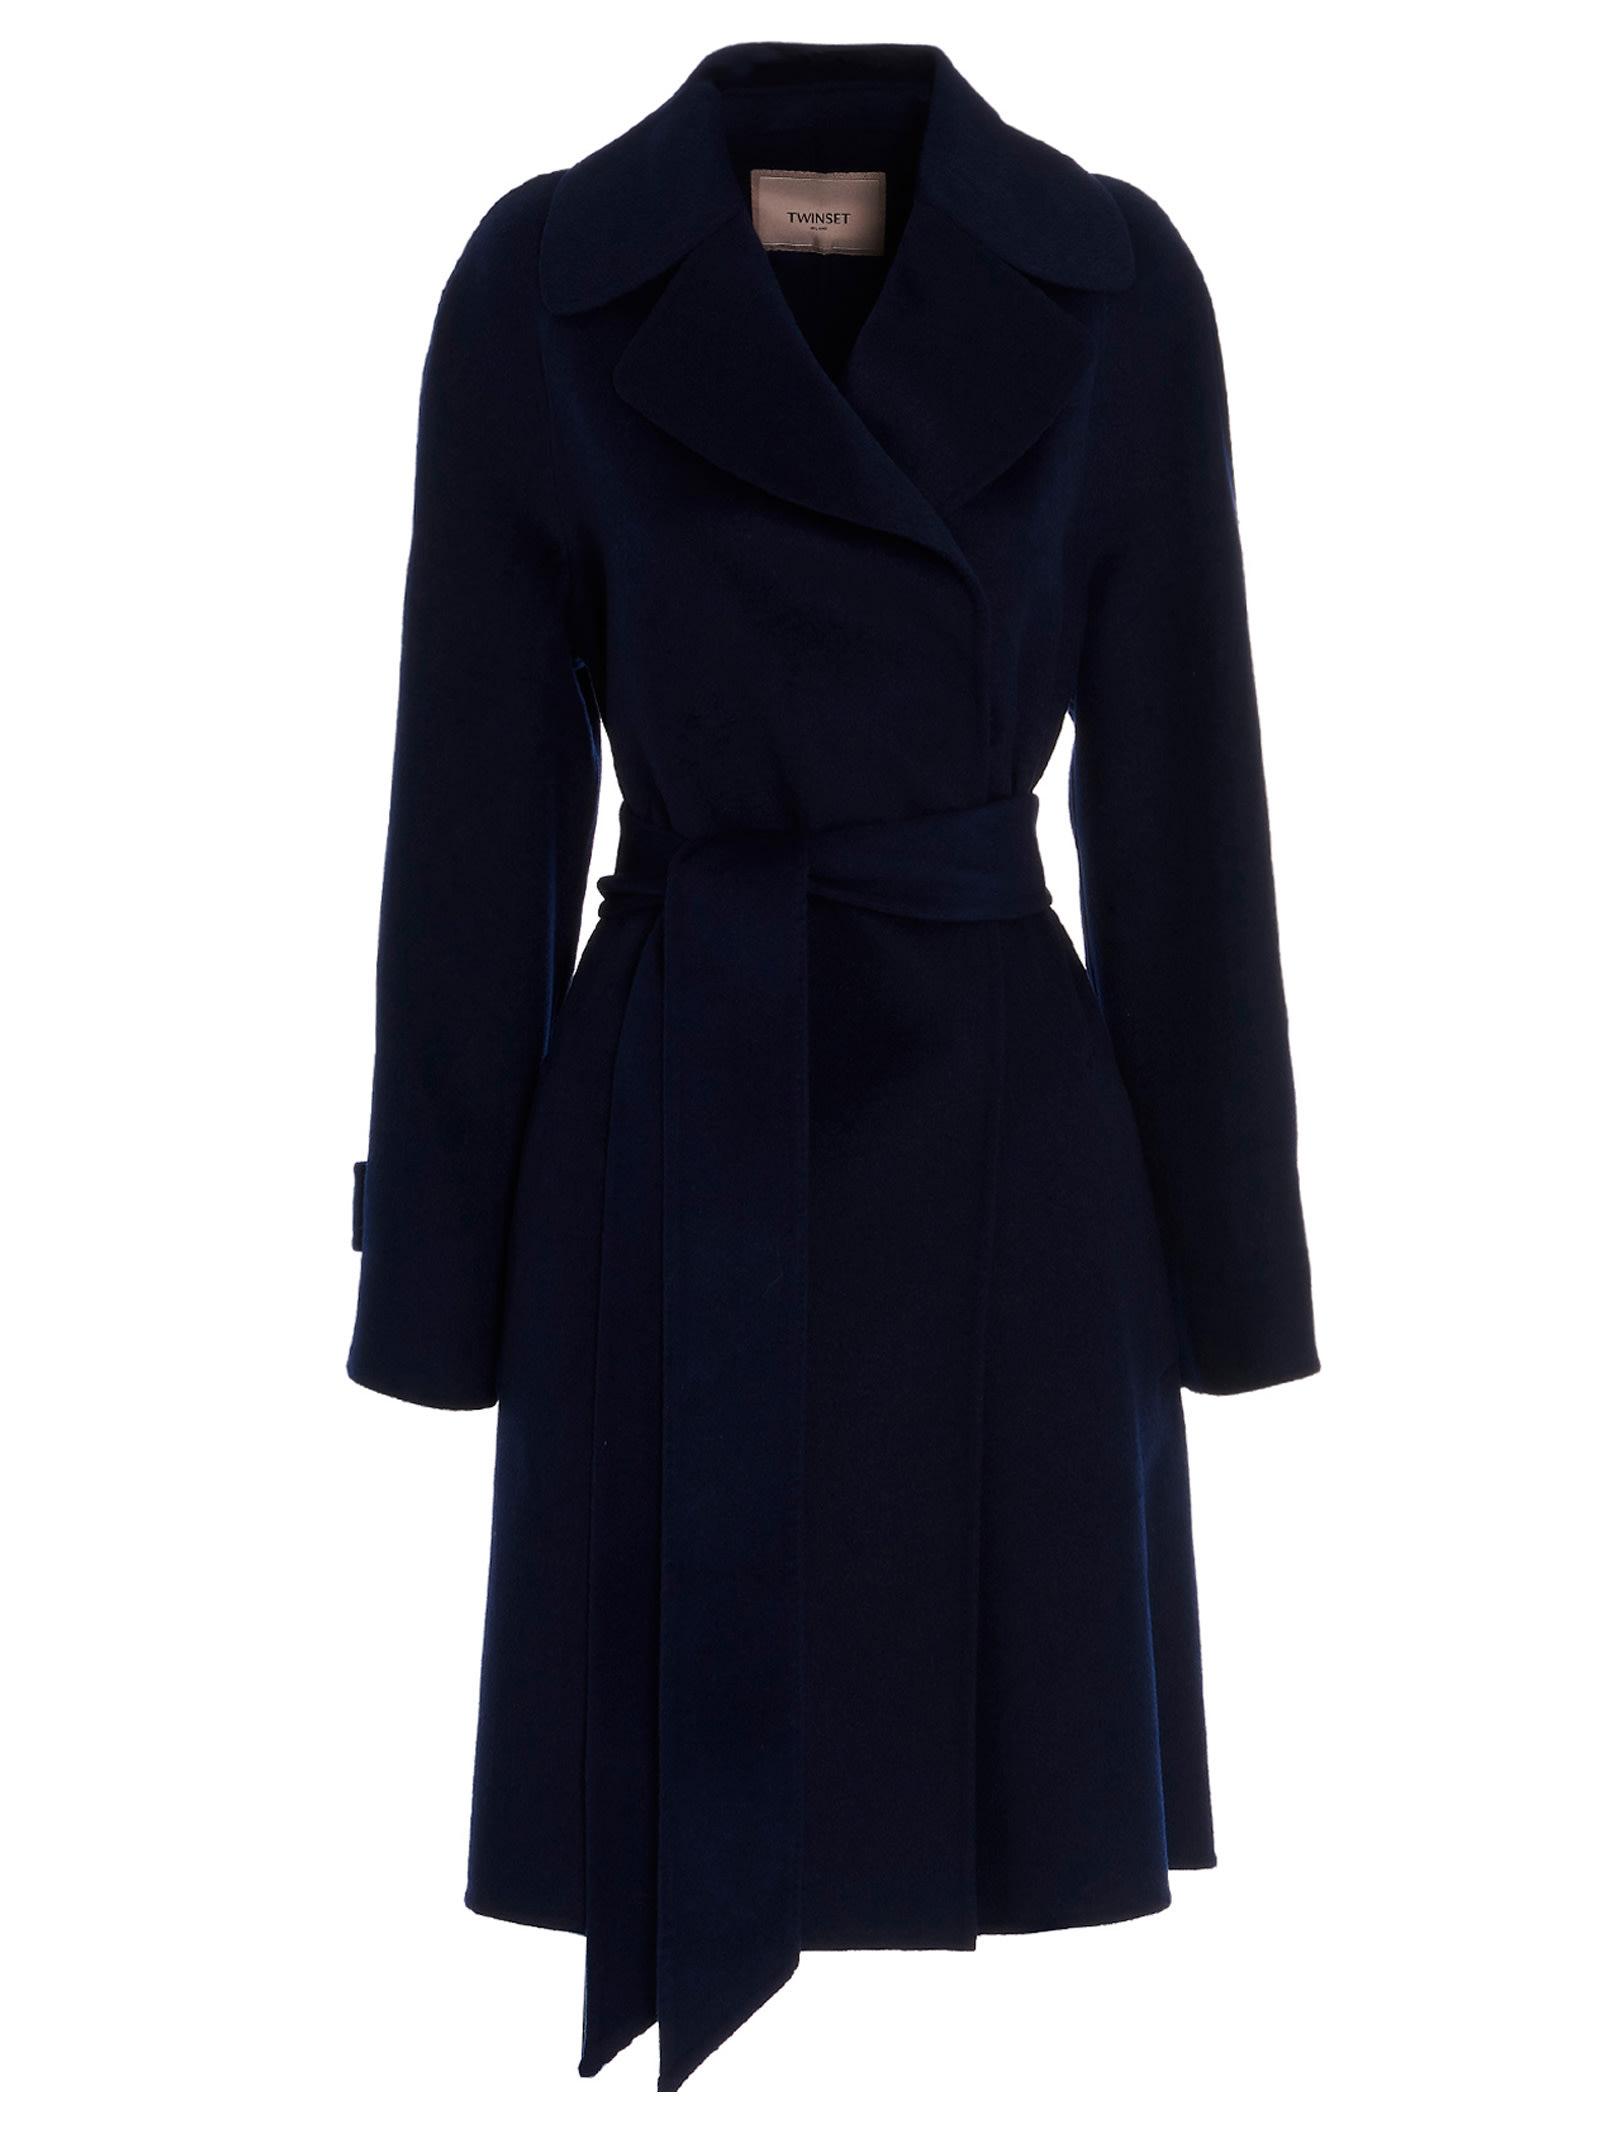 Twinset Coat